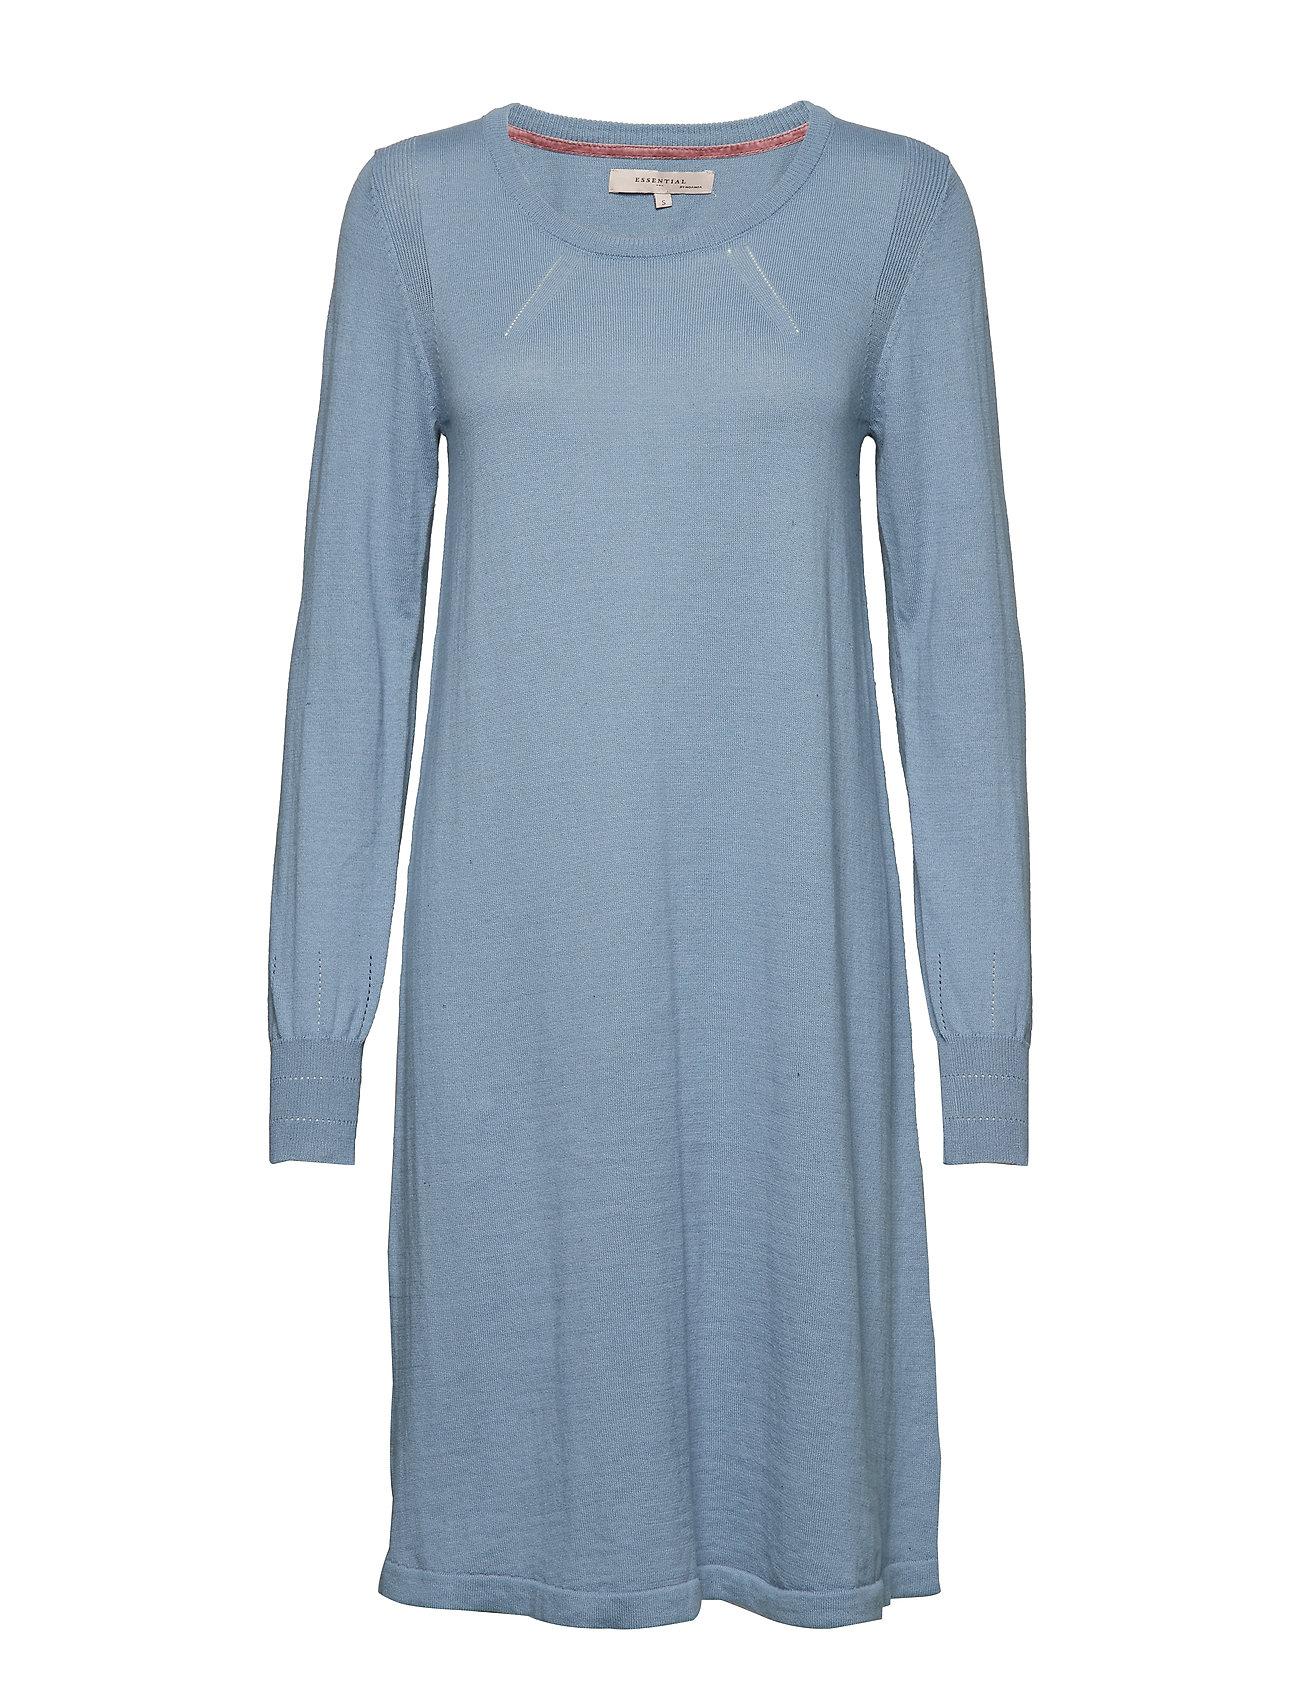 Dress Long Long Sleevefaded Sleevefaded Dress DenimNoa DenimNoa QCtrdxsh